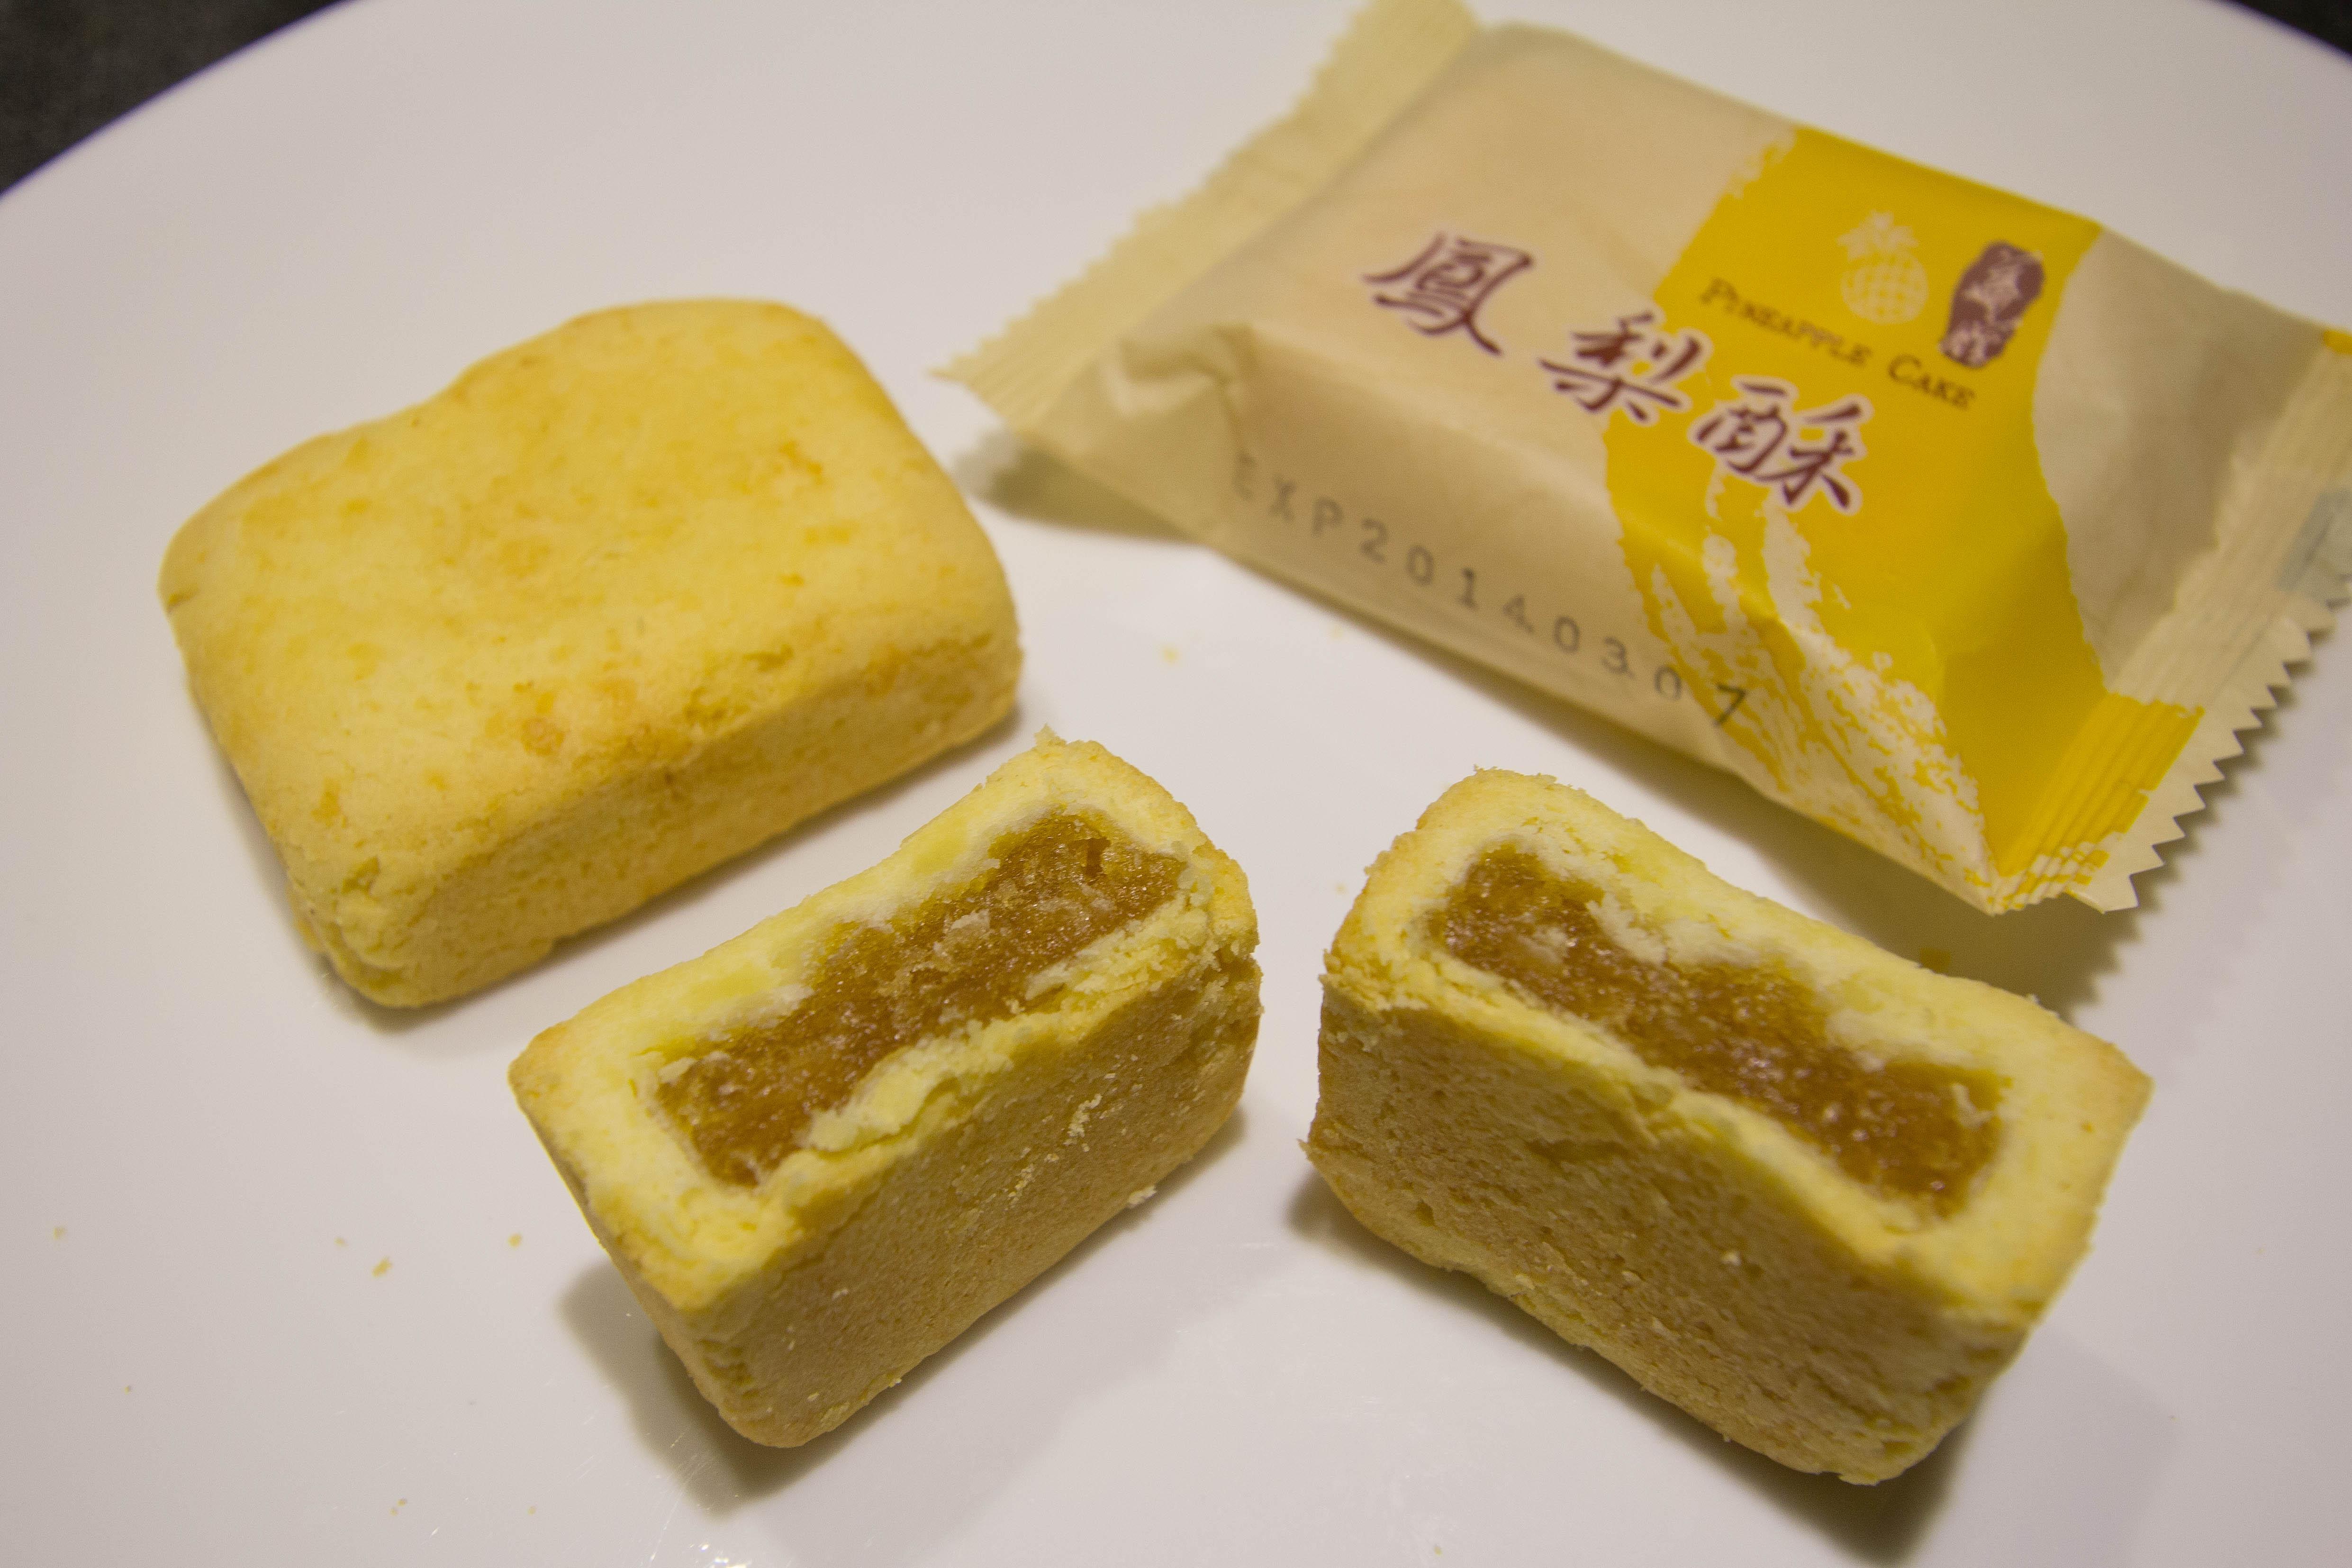 Taiwan: Pineapple Cakes